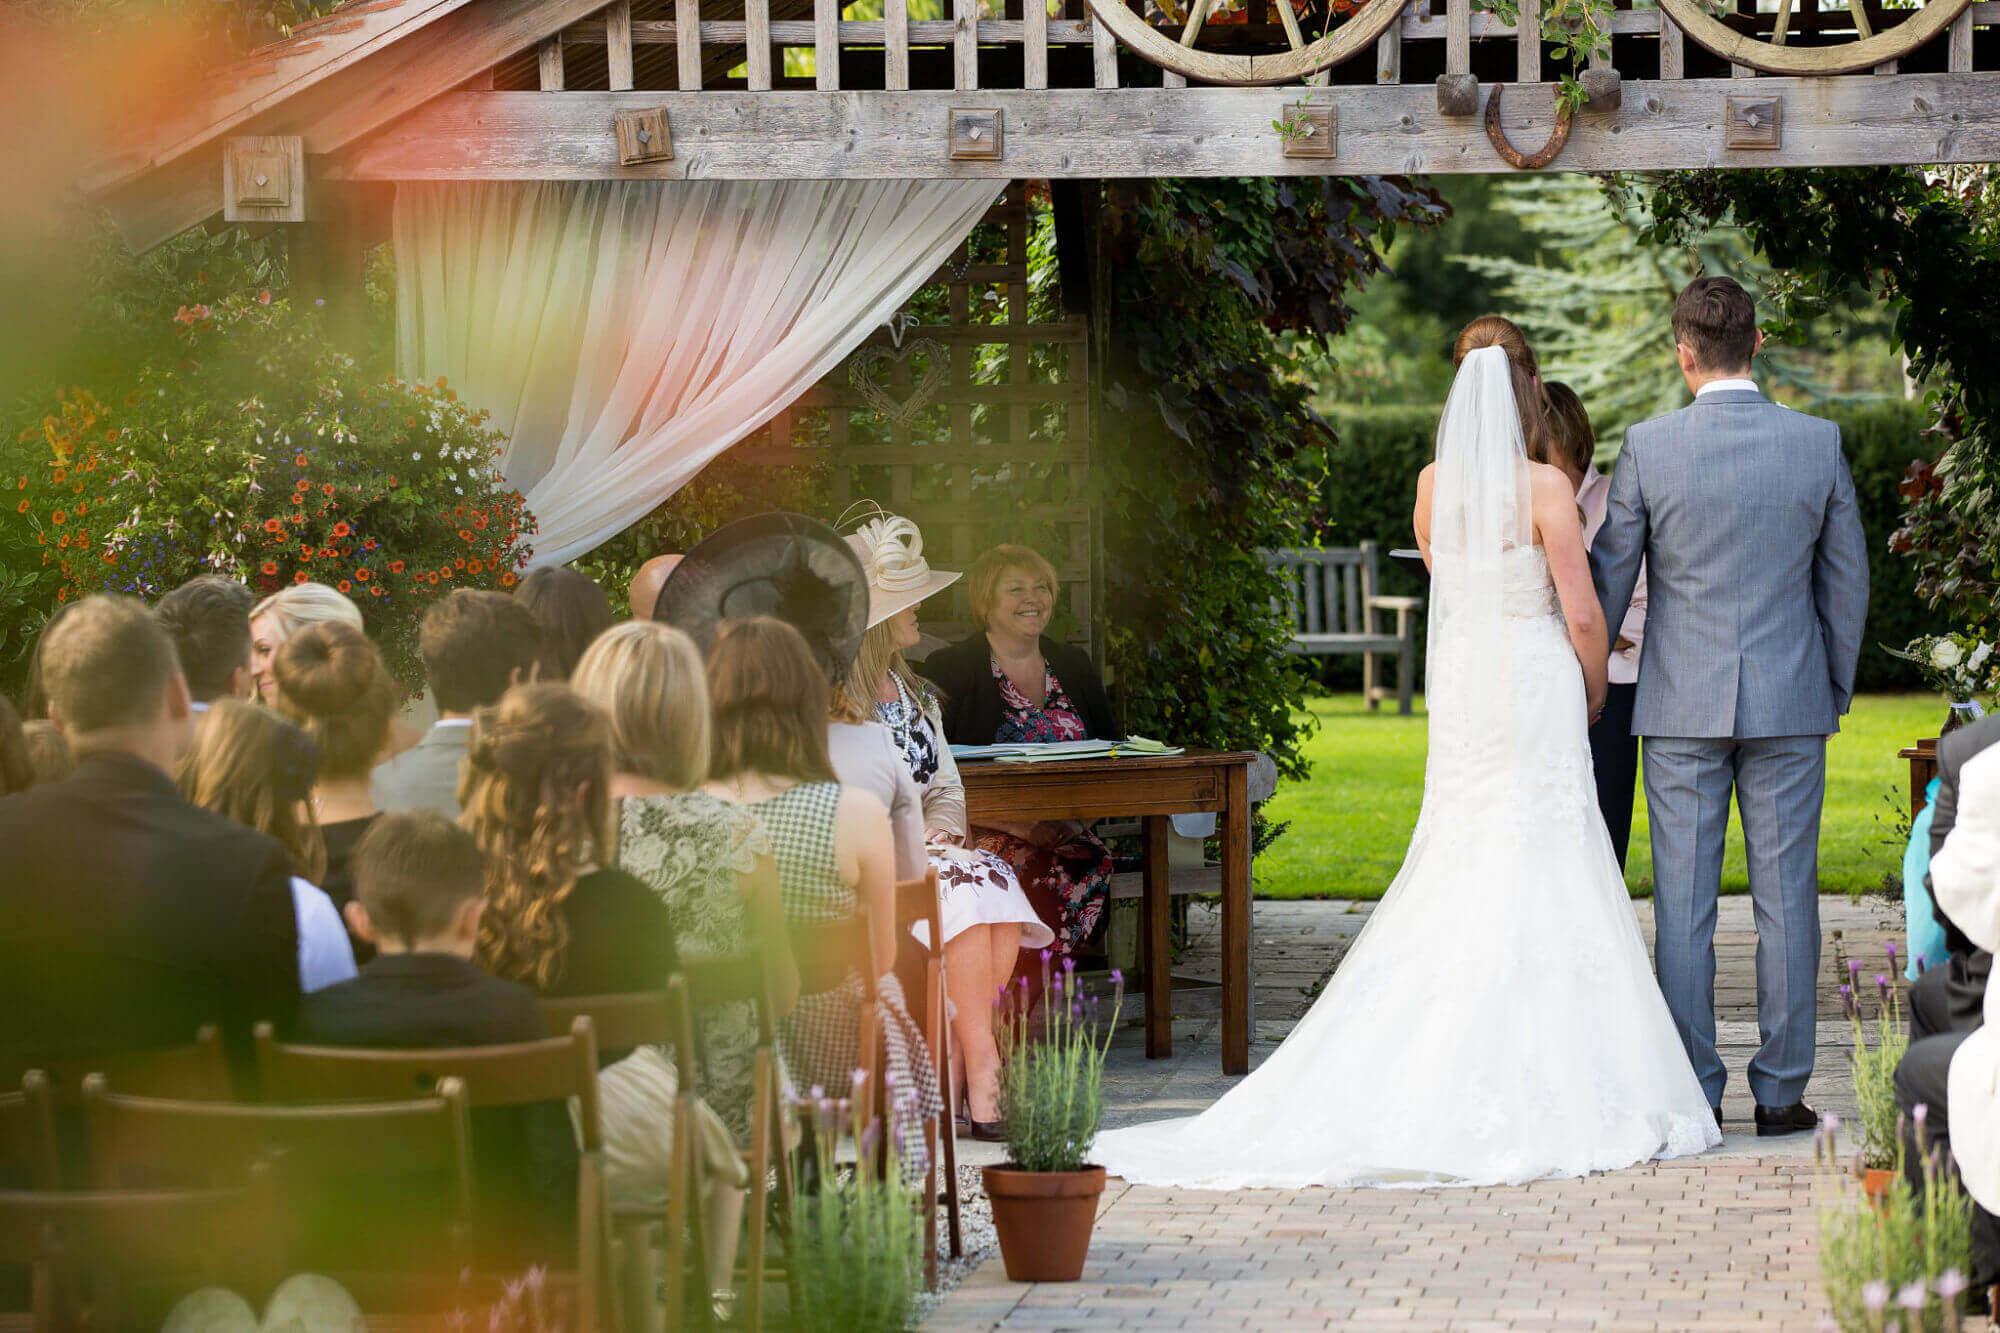 essex-wedding-planner-outside-ceremony.jpg